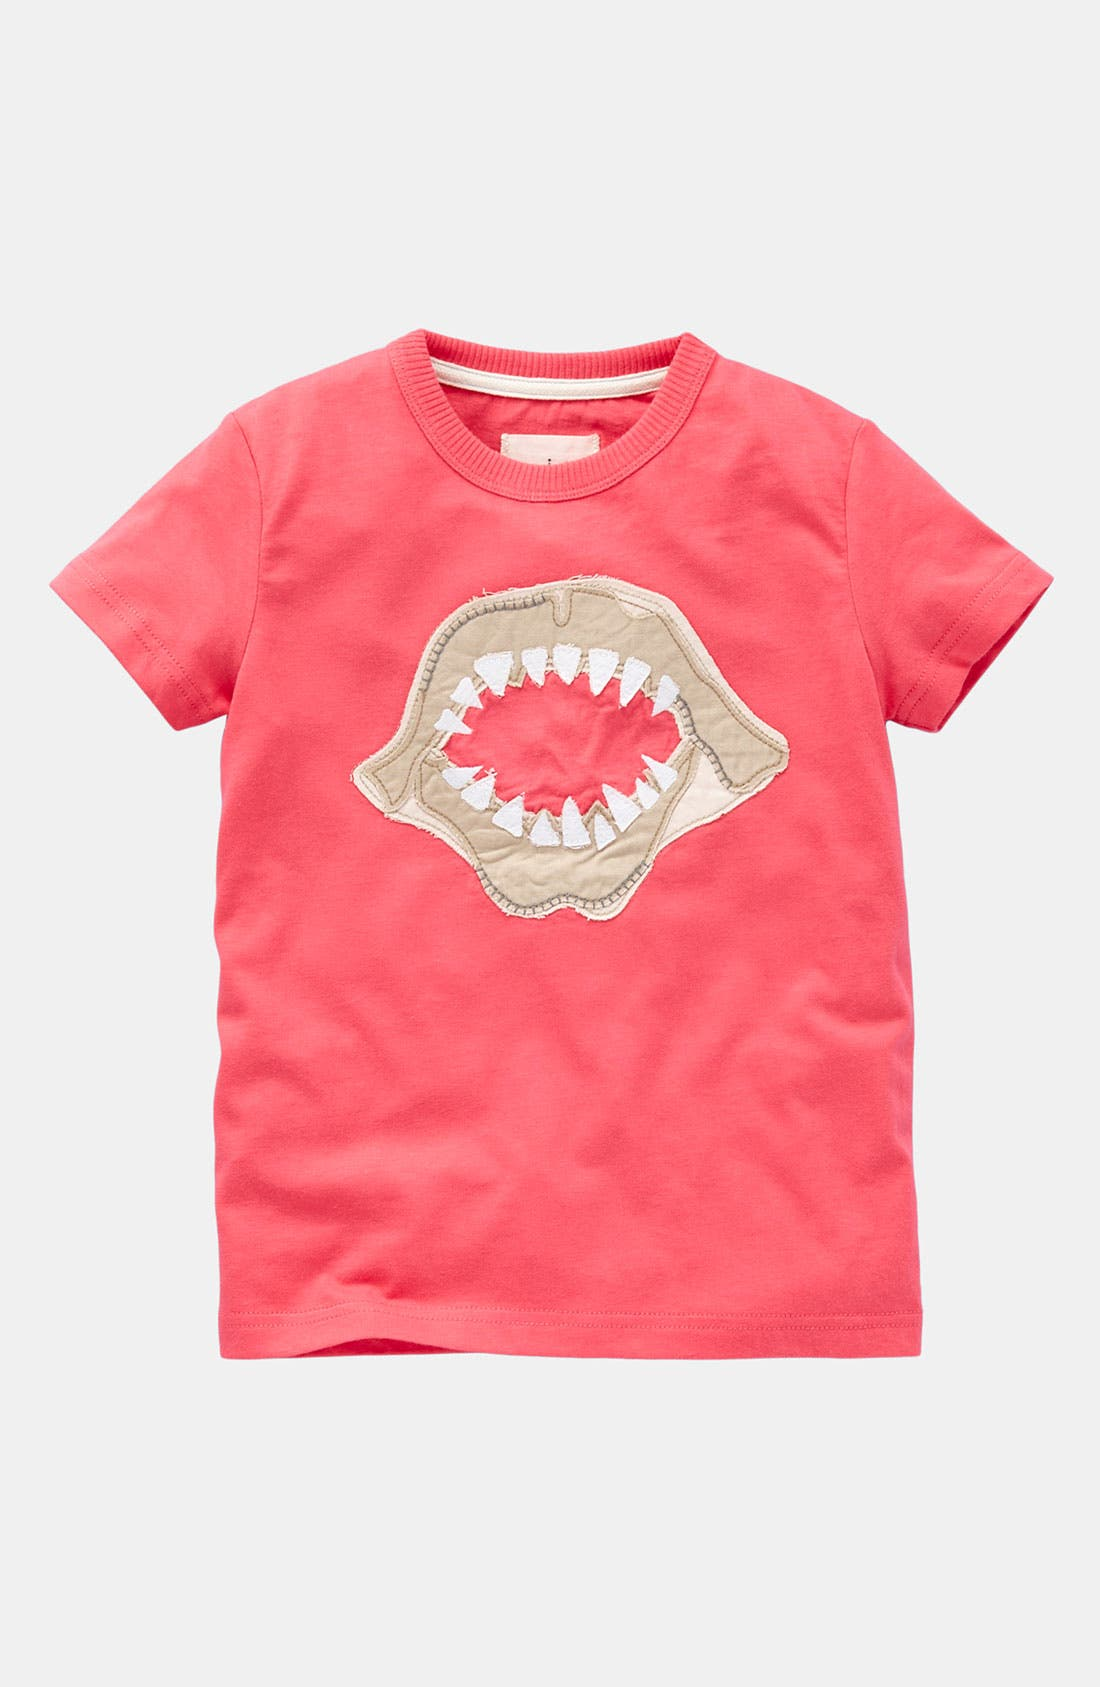 Main Image - Mini Boden 'Nautical' T-Shirt (Toddler)